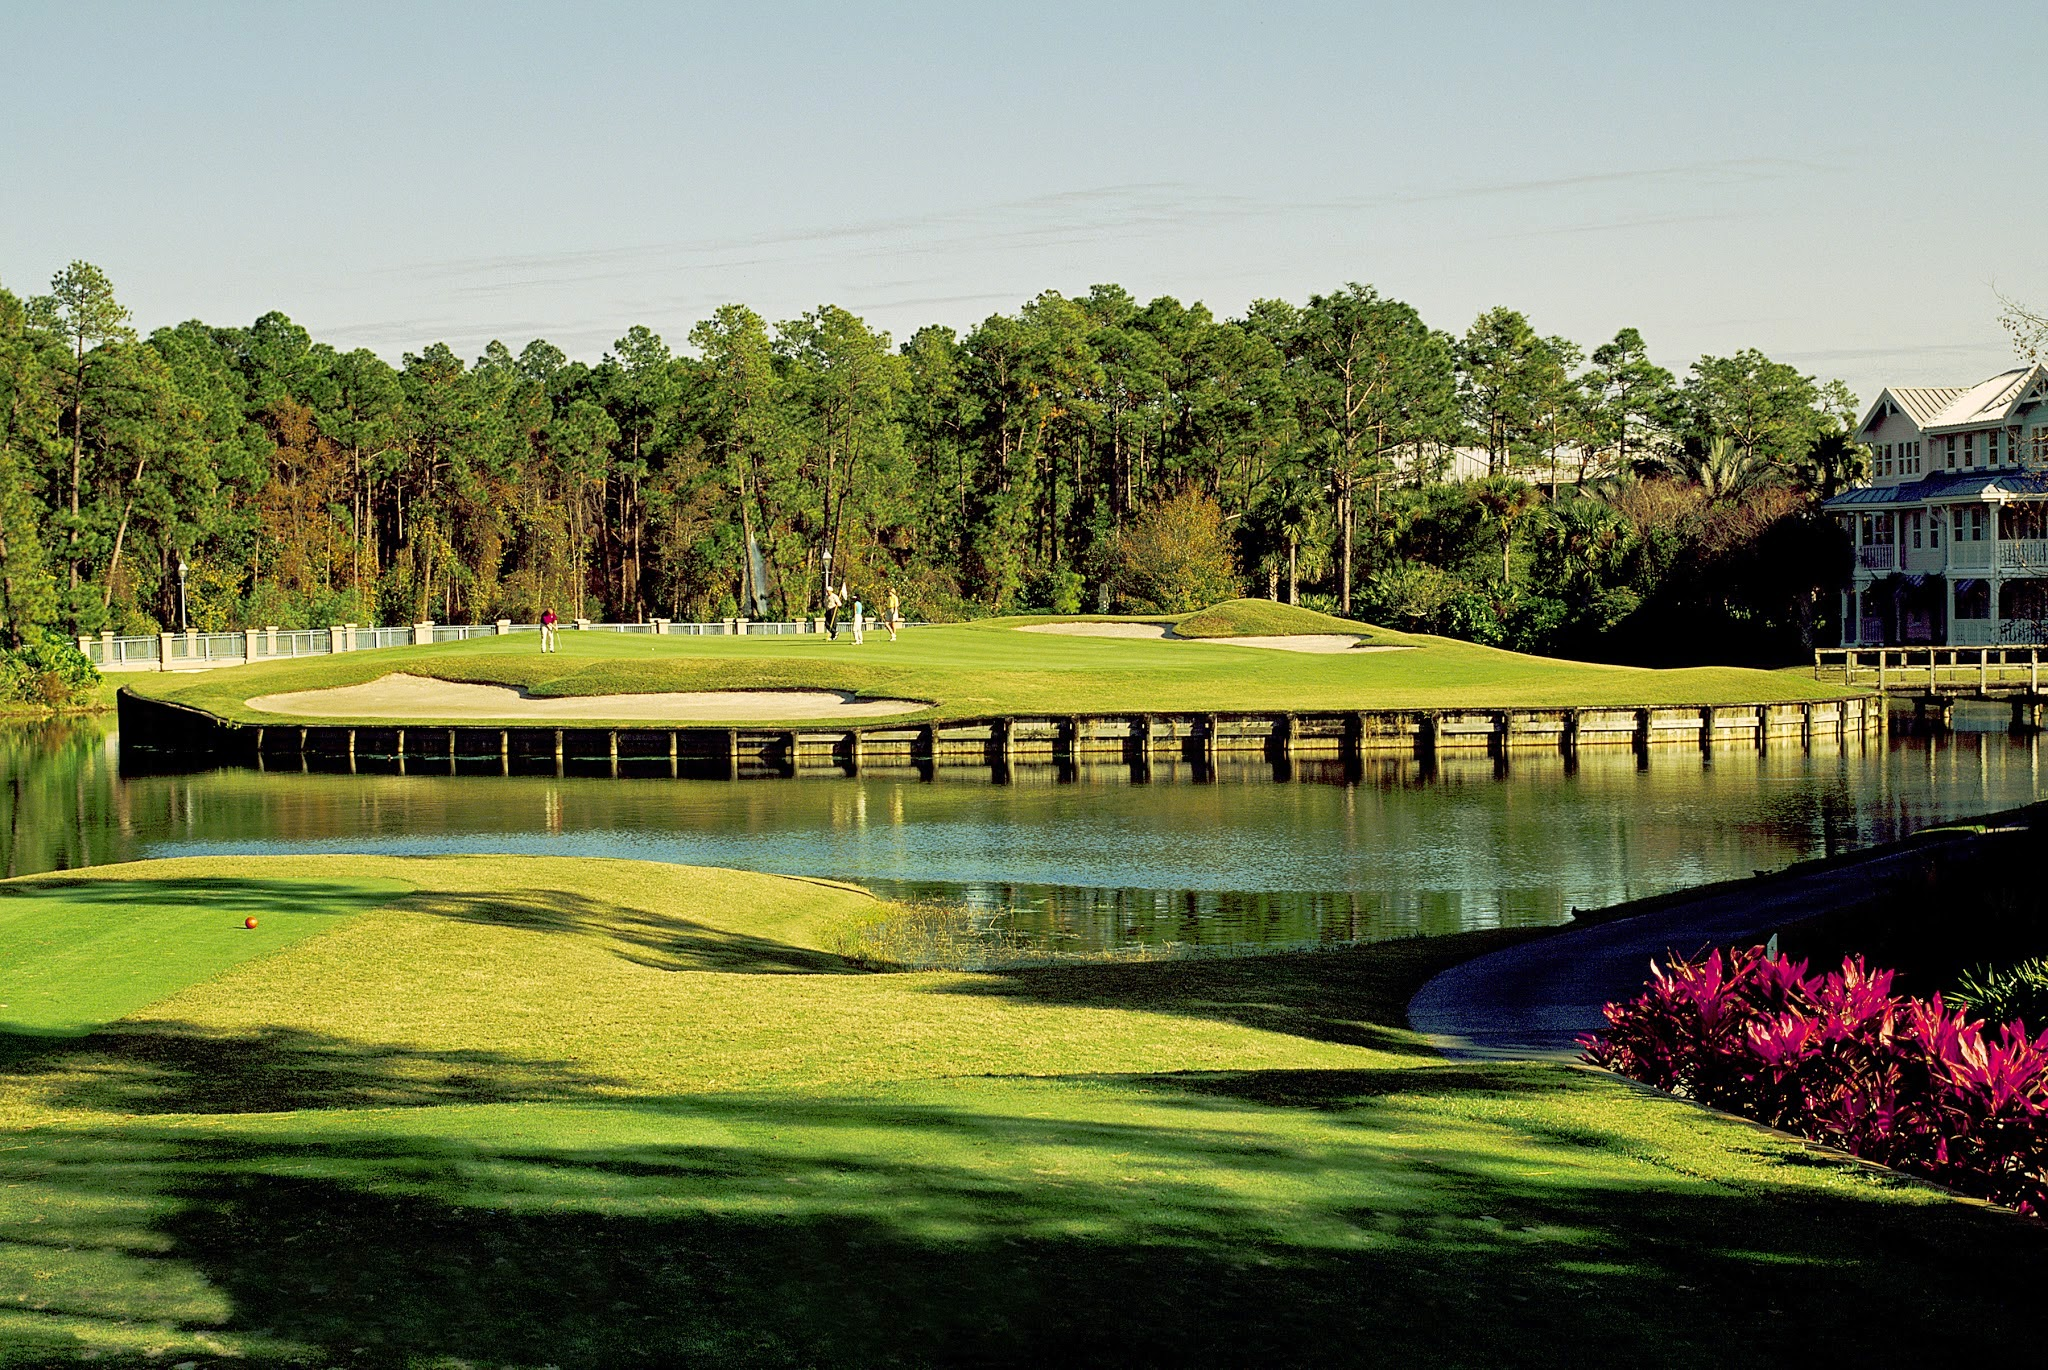 Disney's Lake Buena Vista Golf Course image 0